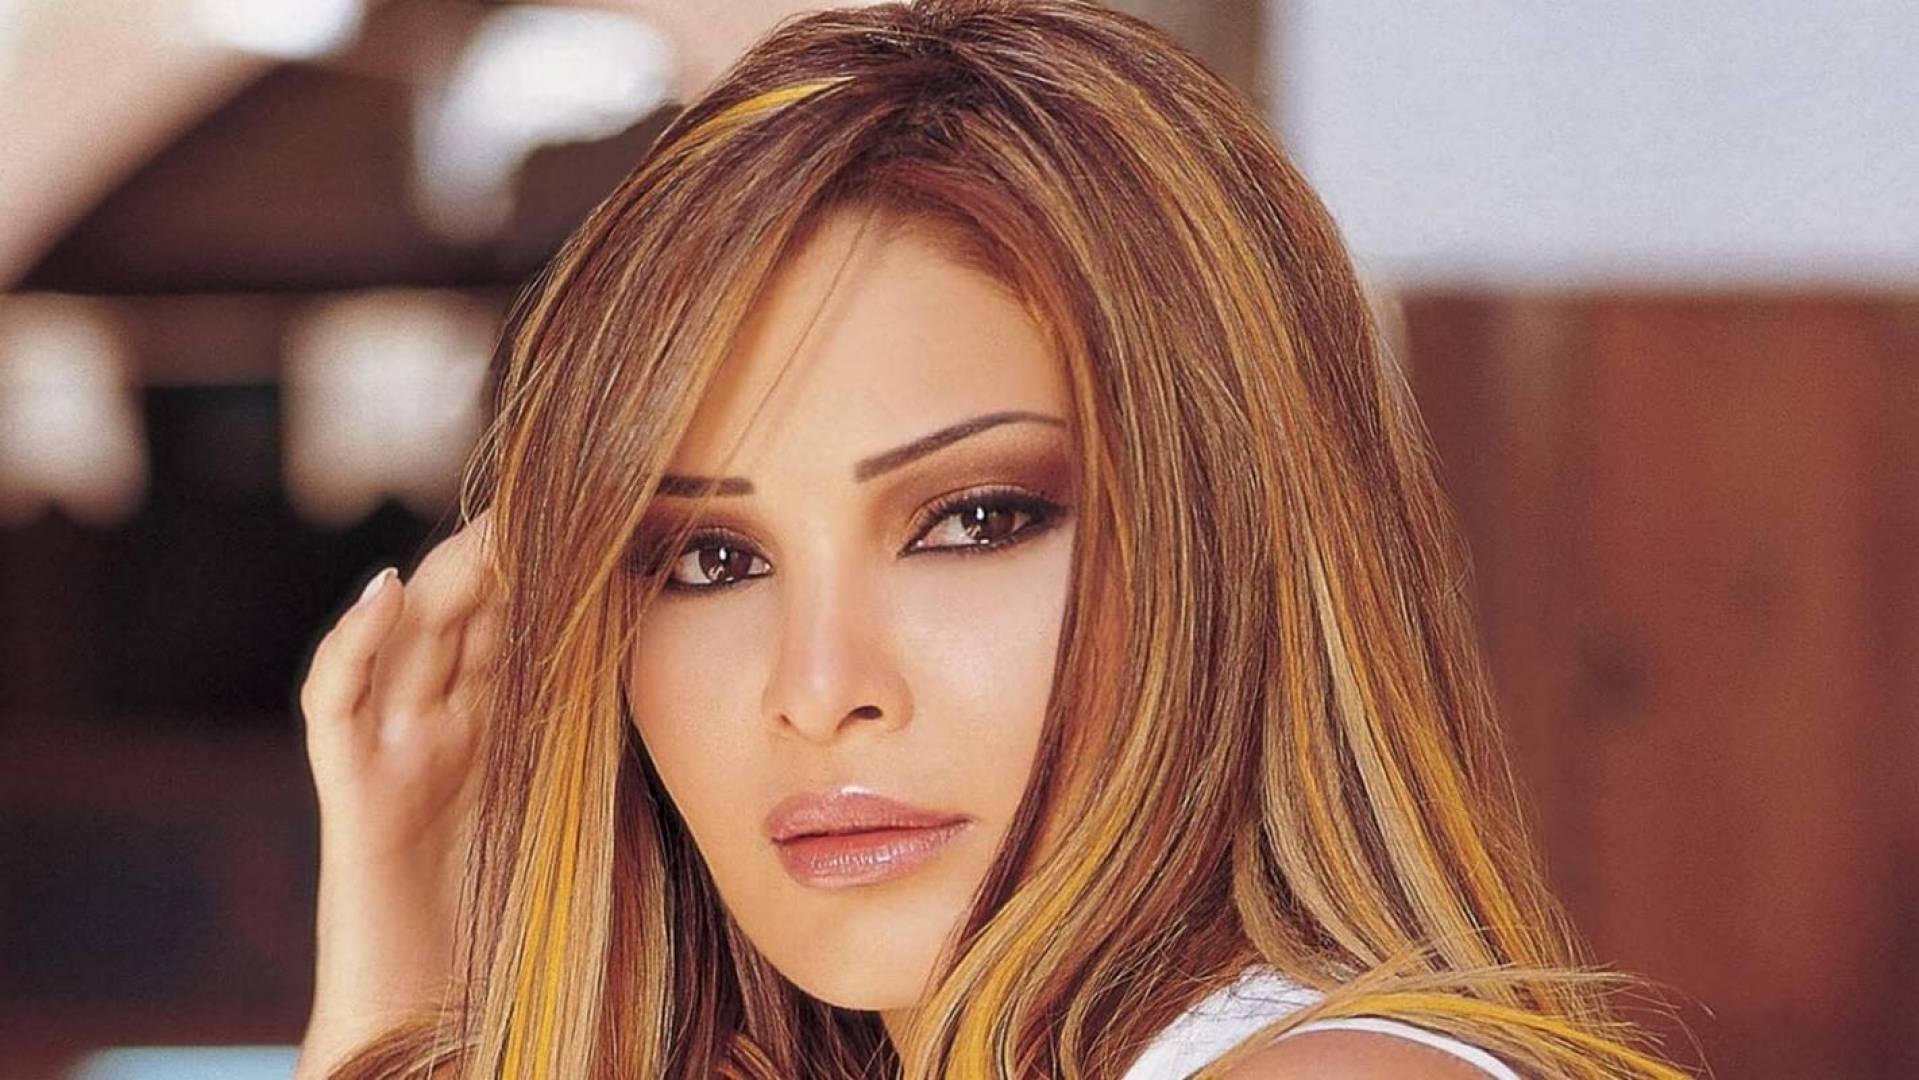 سوزان-تميم_512753_highres.jpg